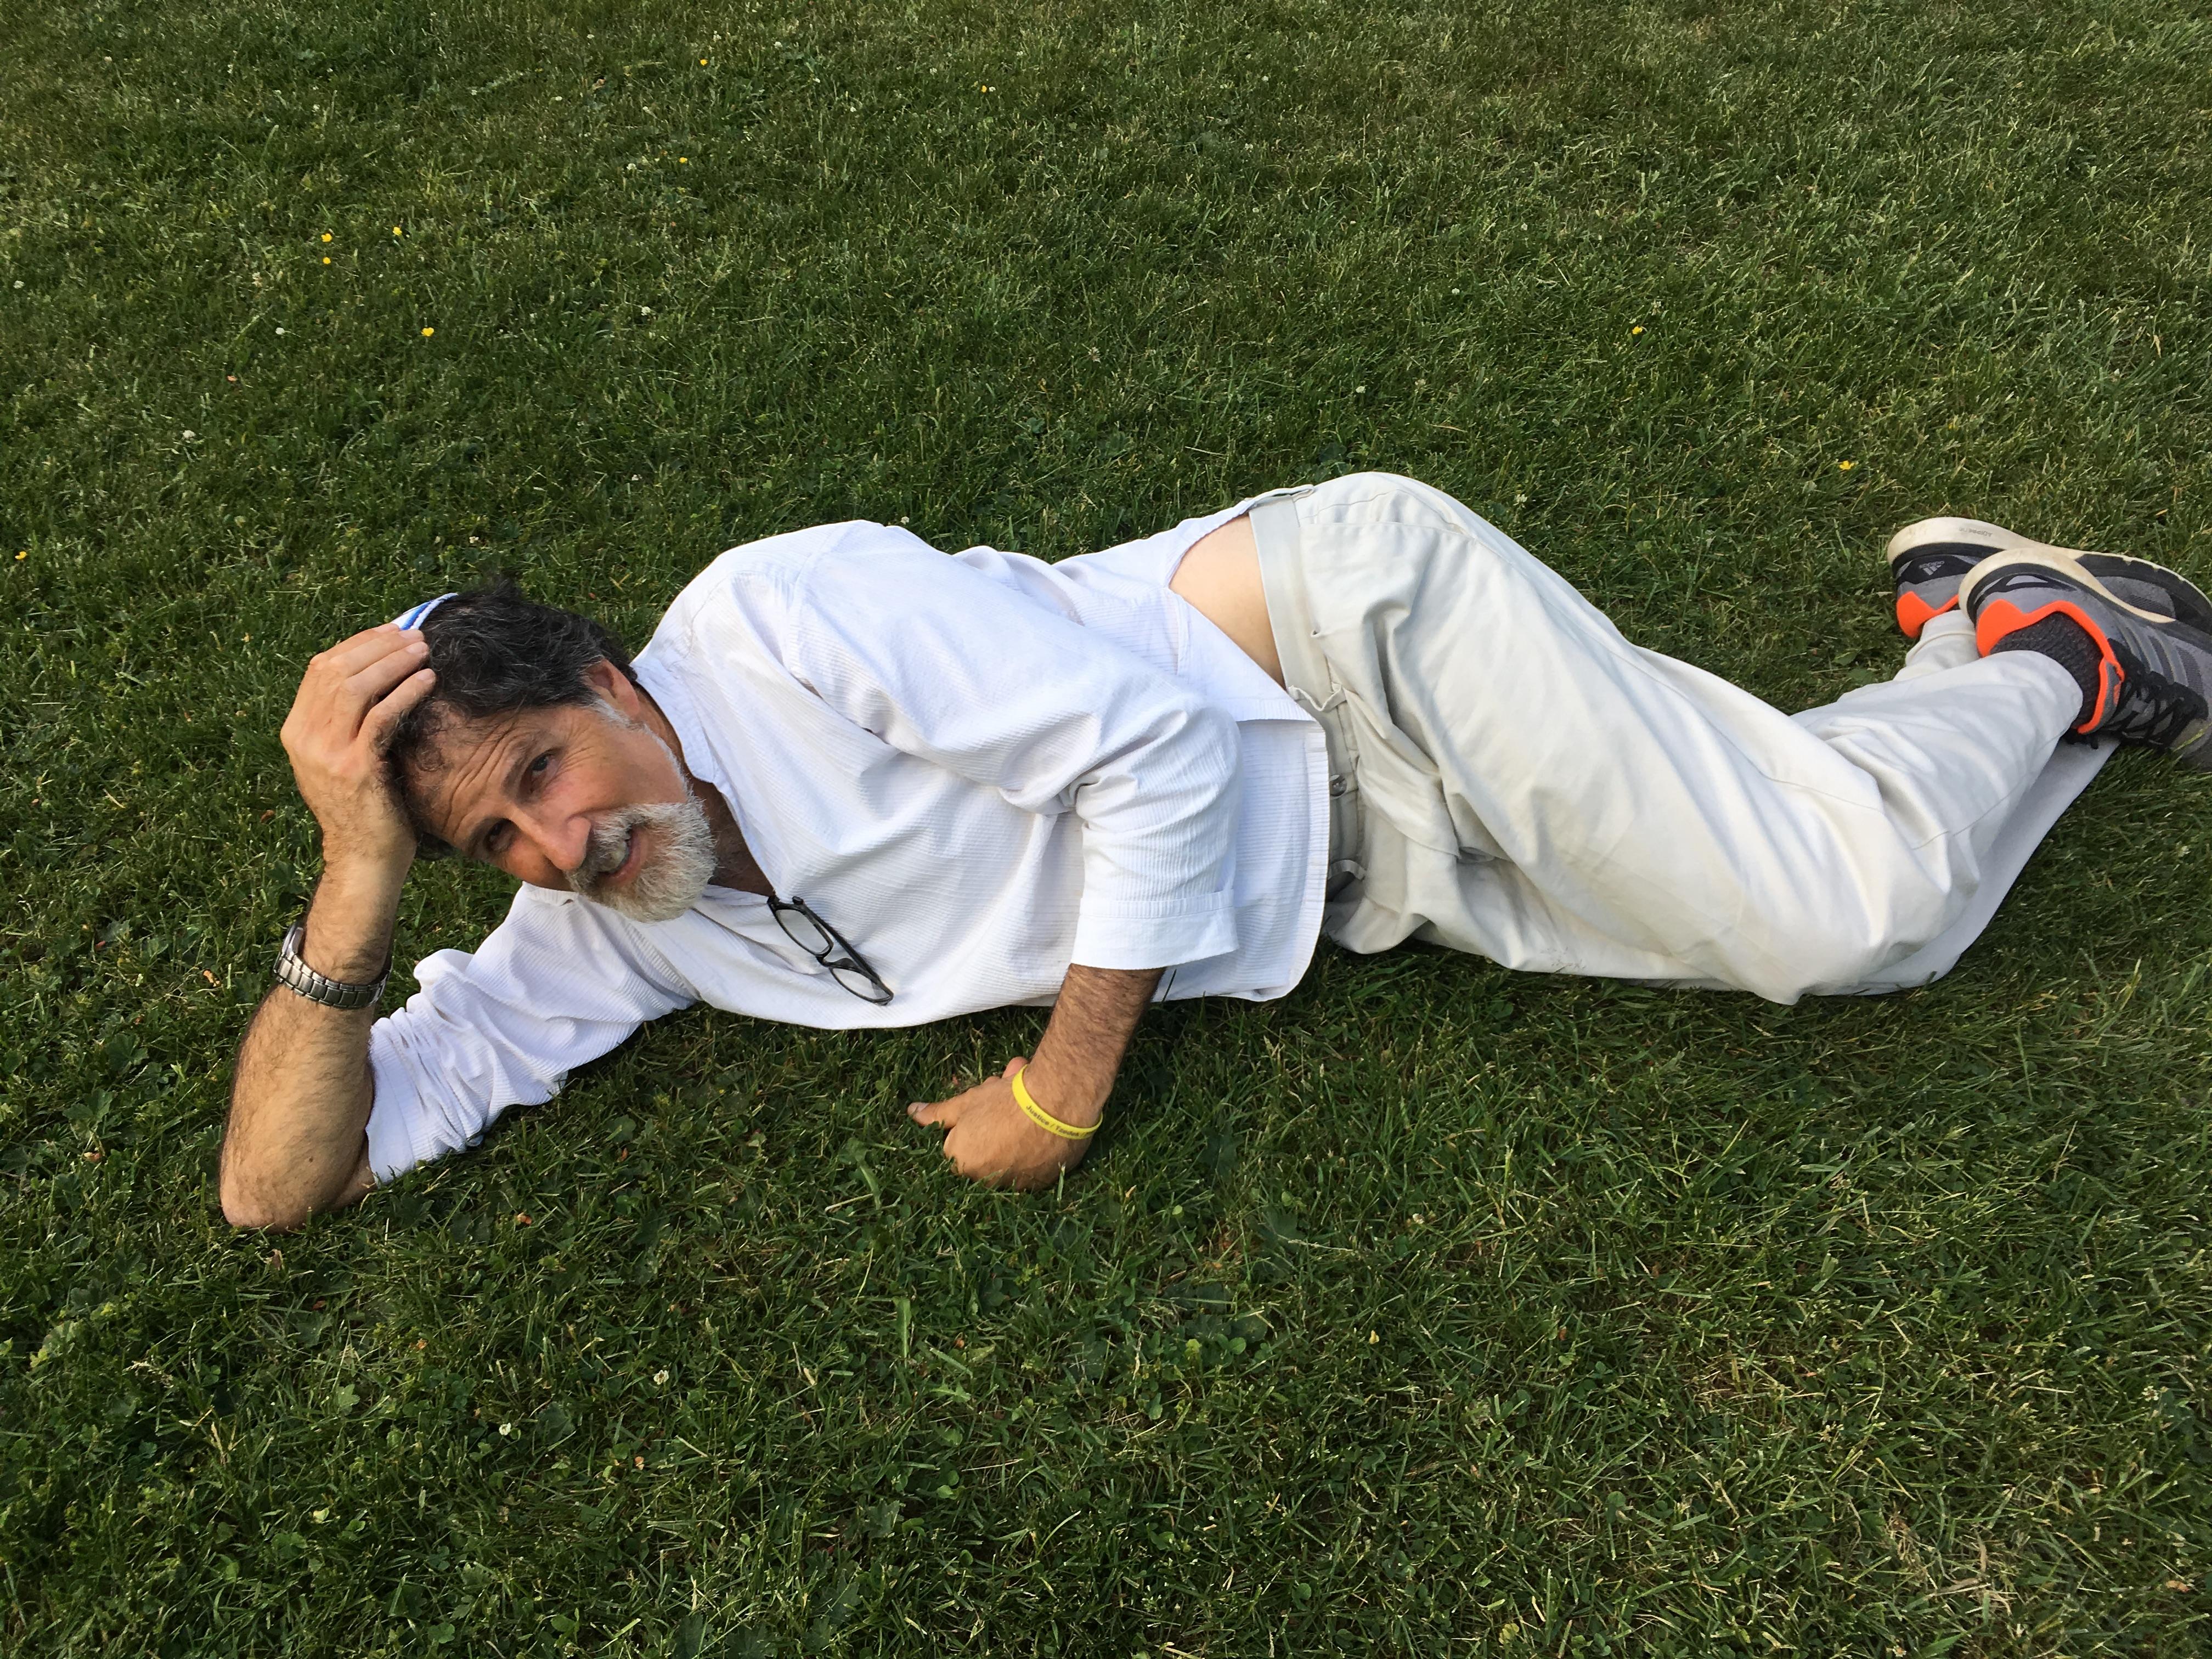 Israel/Palestina/Sverige: Vila i gräset